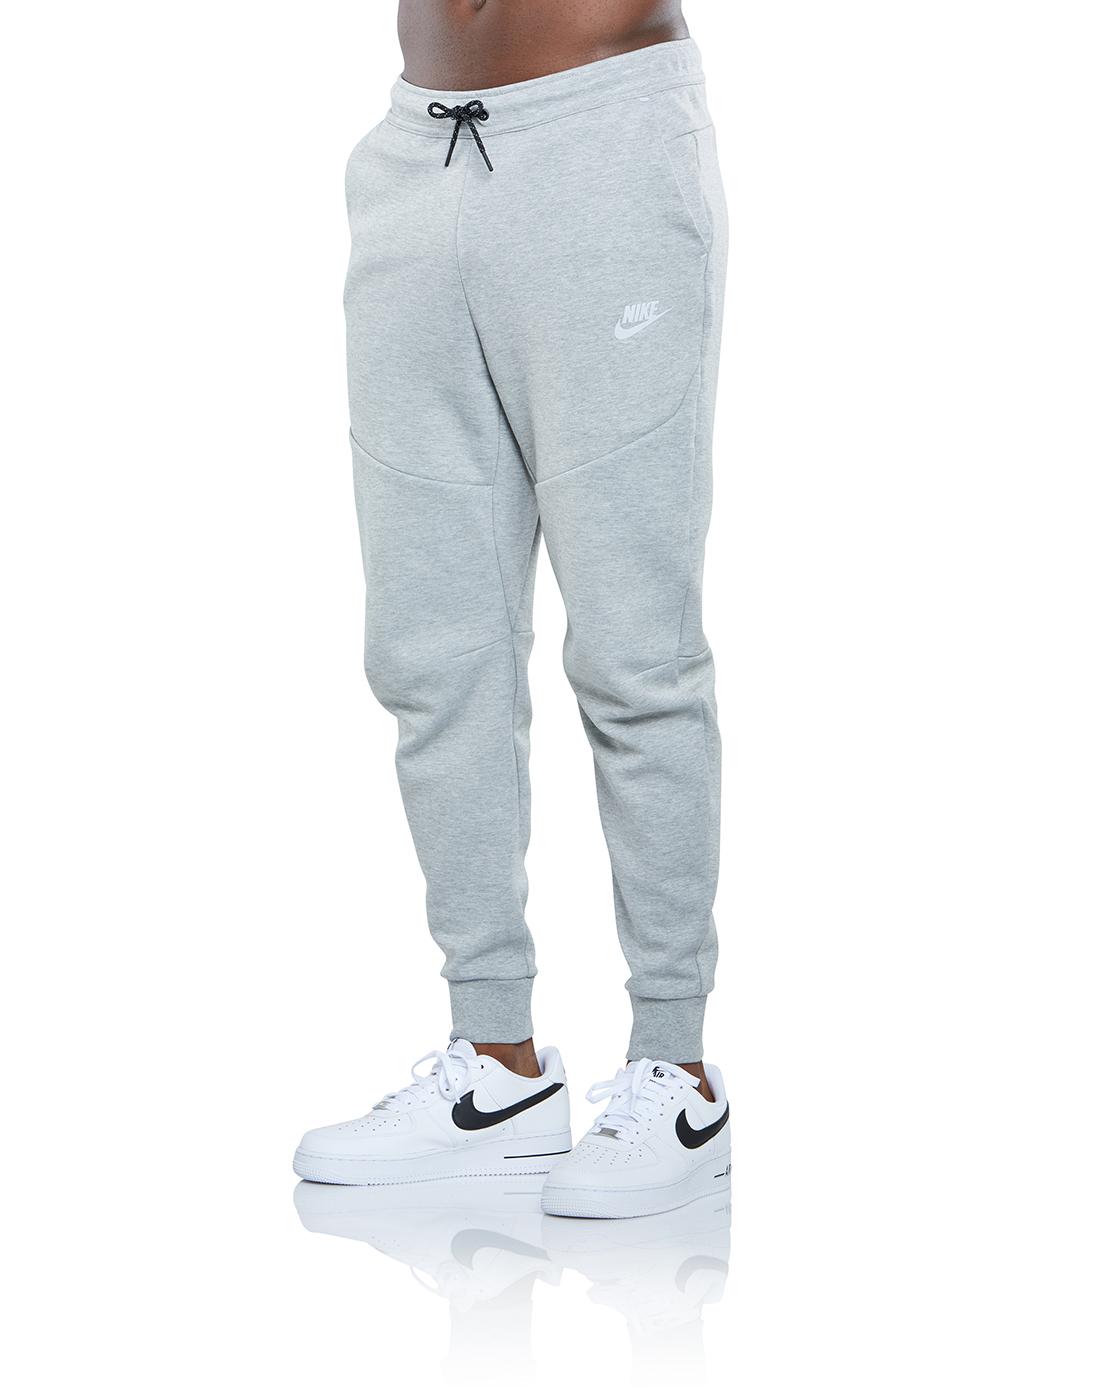 Nike Mens Tech Fleece Reflective Pants Grey Life Style Sports Ie